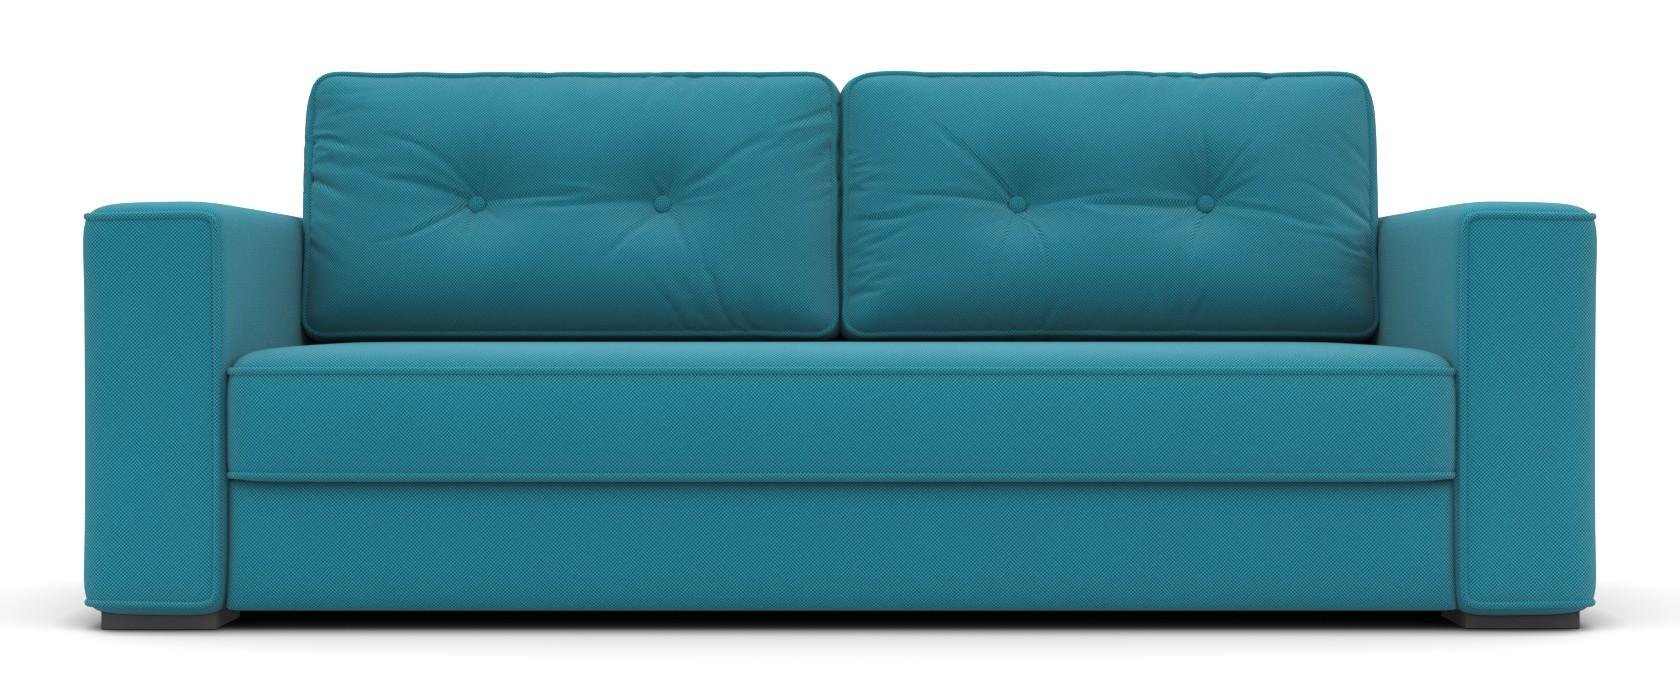 Трехместный диван Silvio - Pufetto